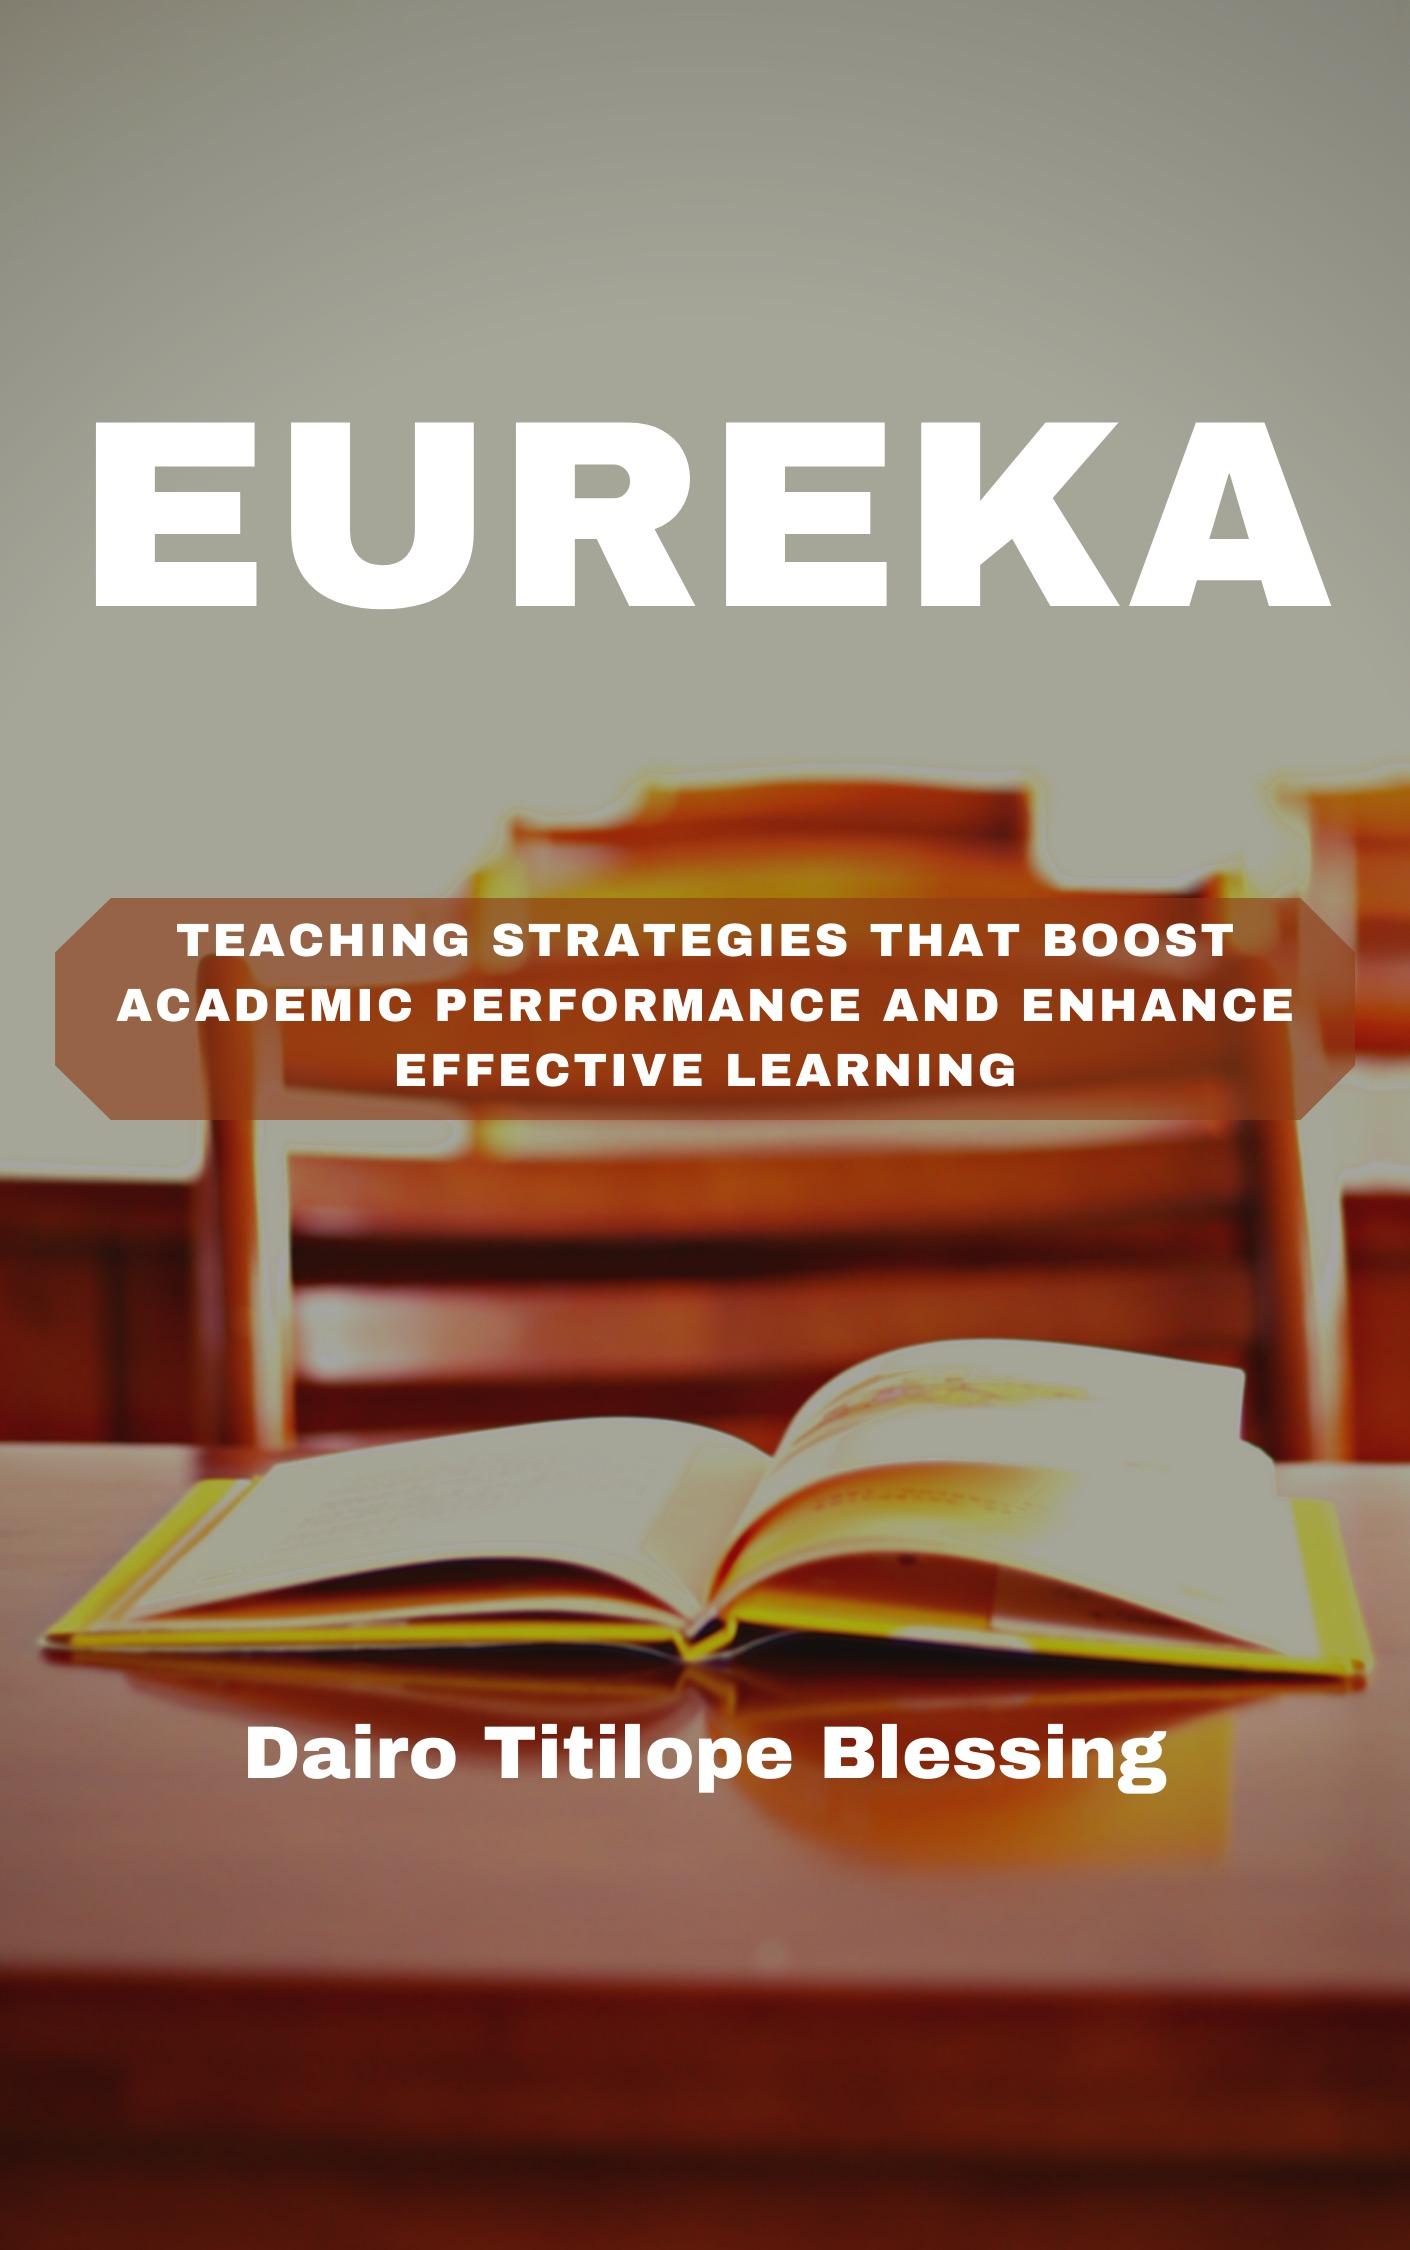 EUREKA  (Teaching strategies that boost academic performance and